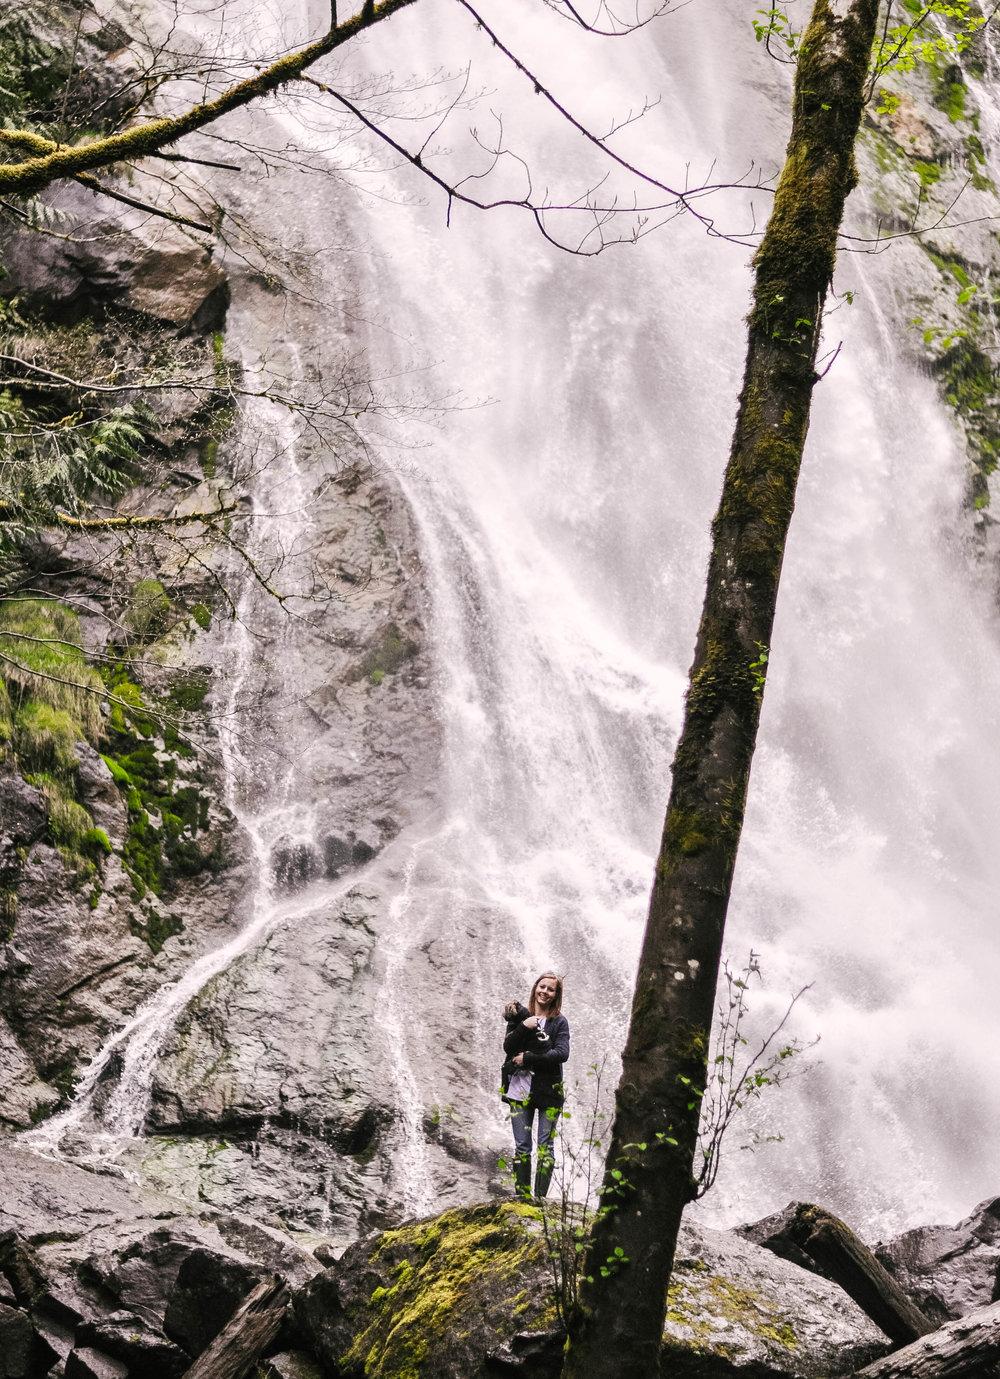 Rocky-Brook-Falls-12.jpg